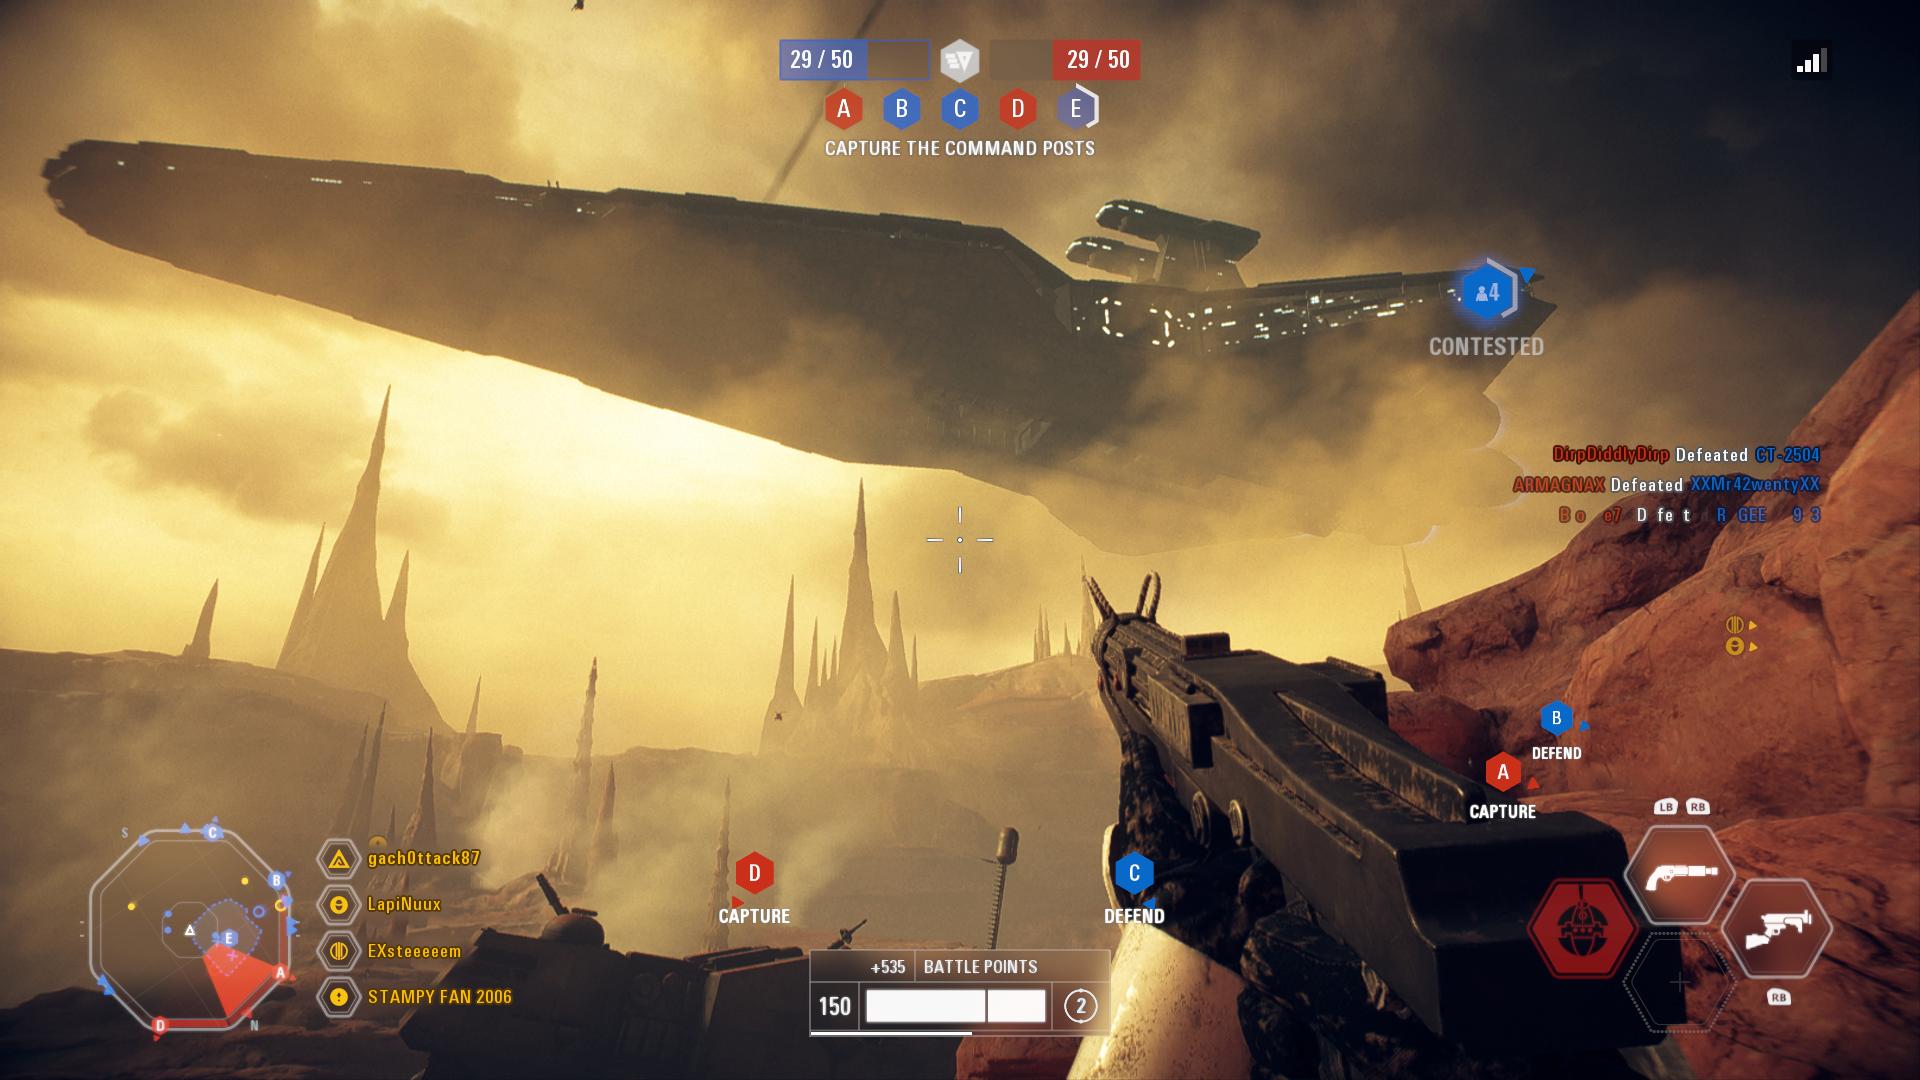 Star Wars: Battlefront II's New Mode Is Fun, When It Works